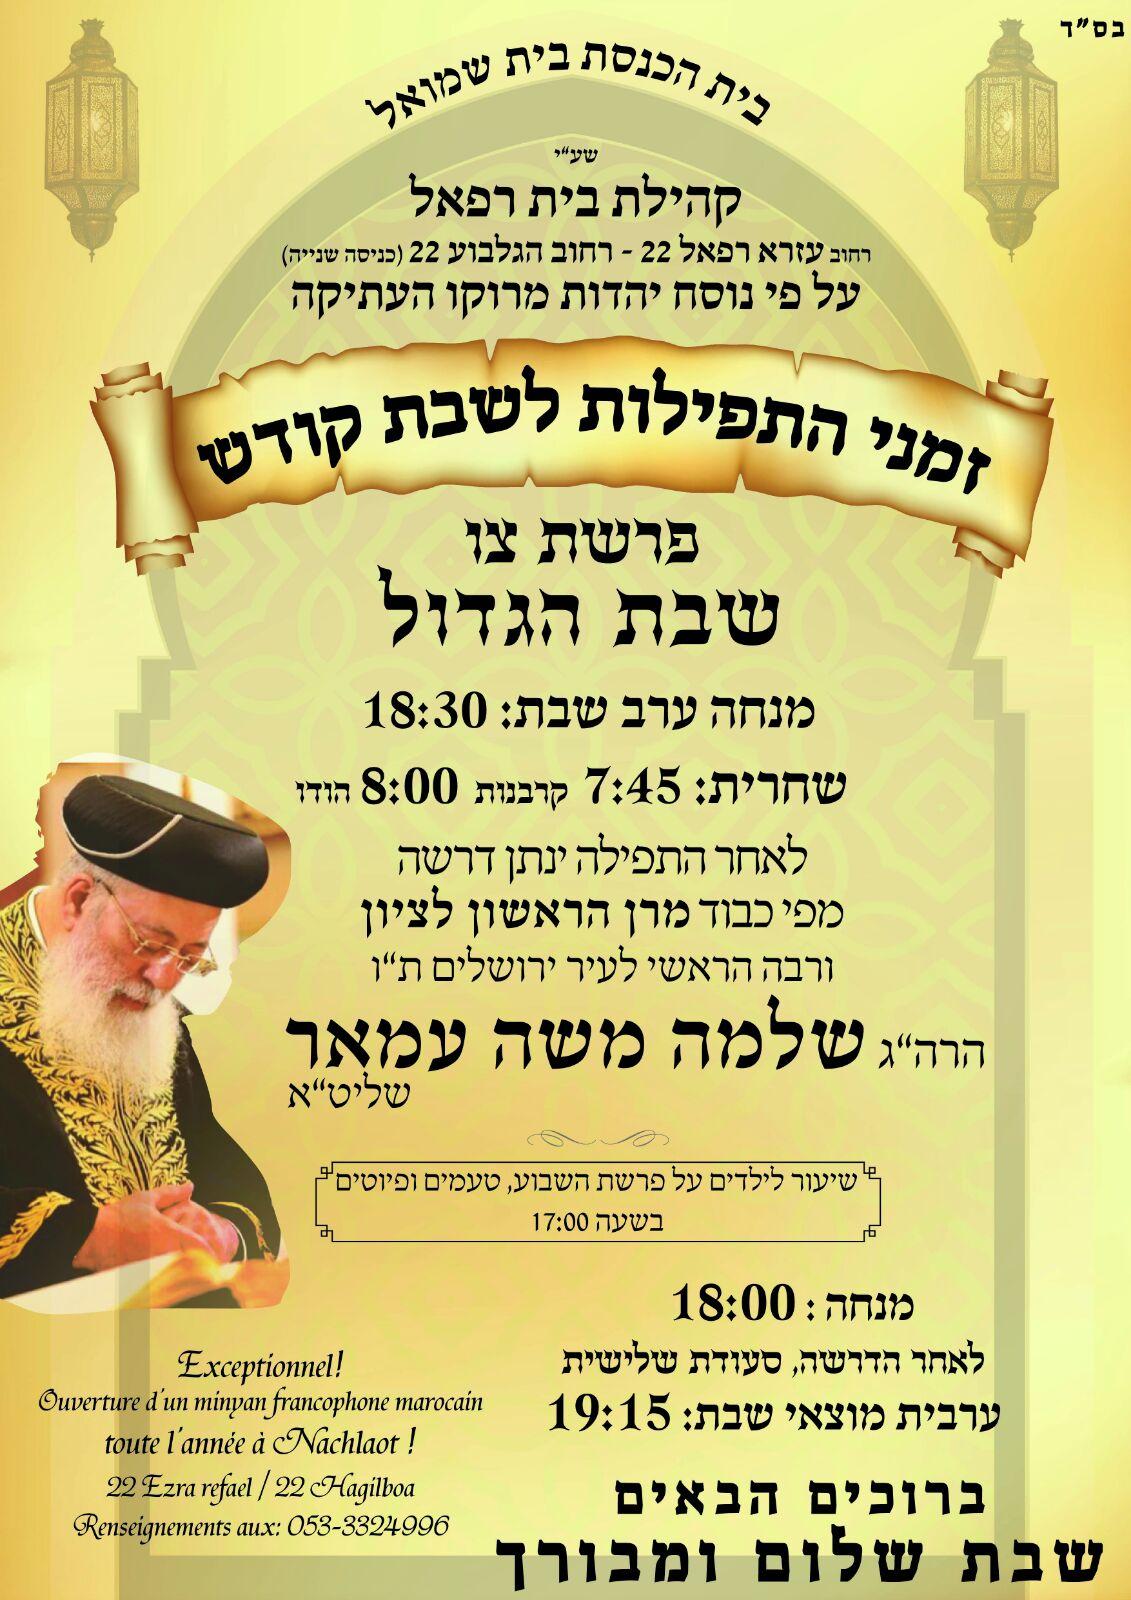 nahlaot synagogue pessah shabbat